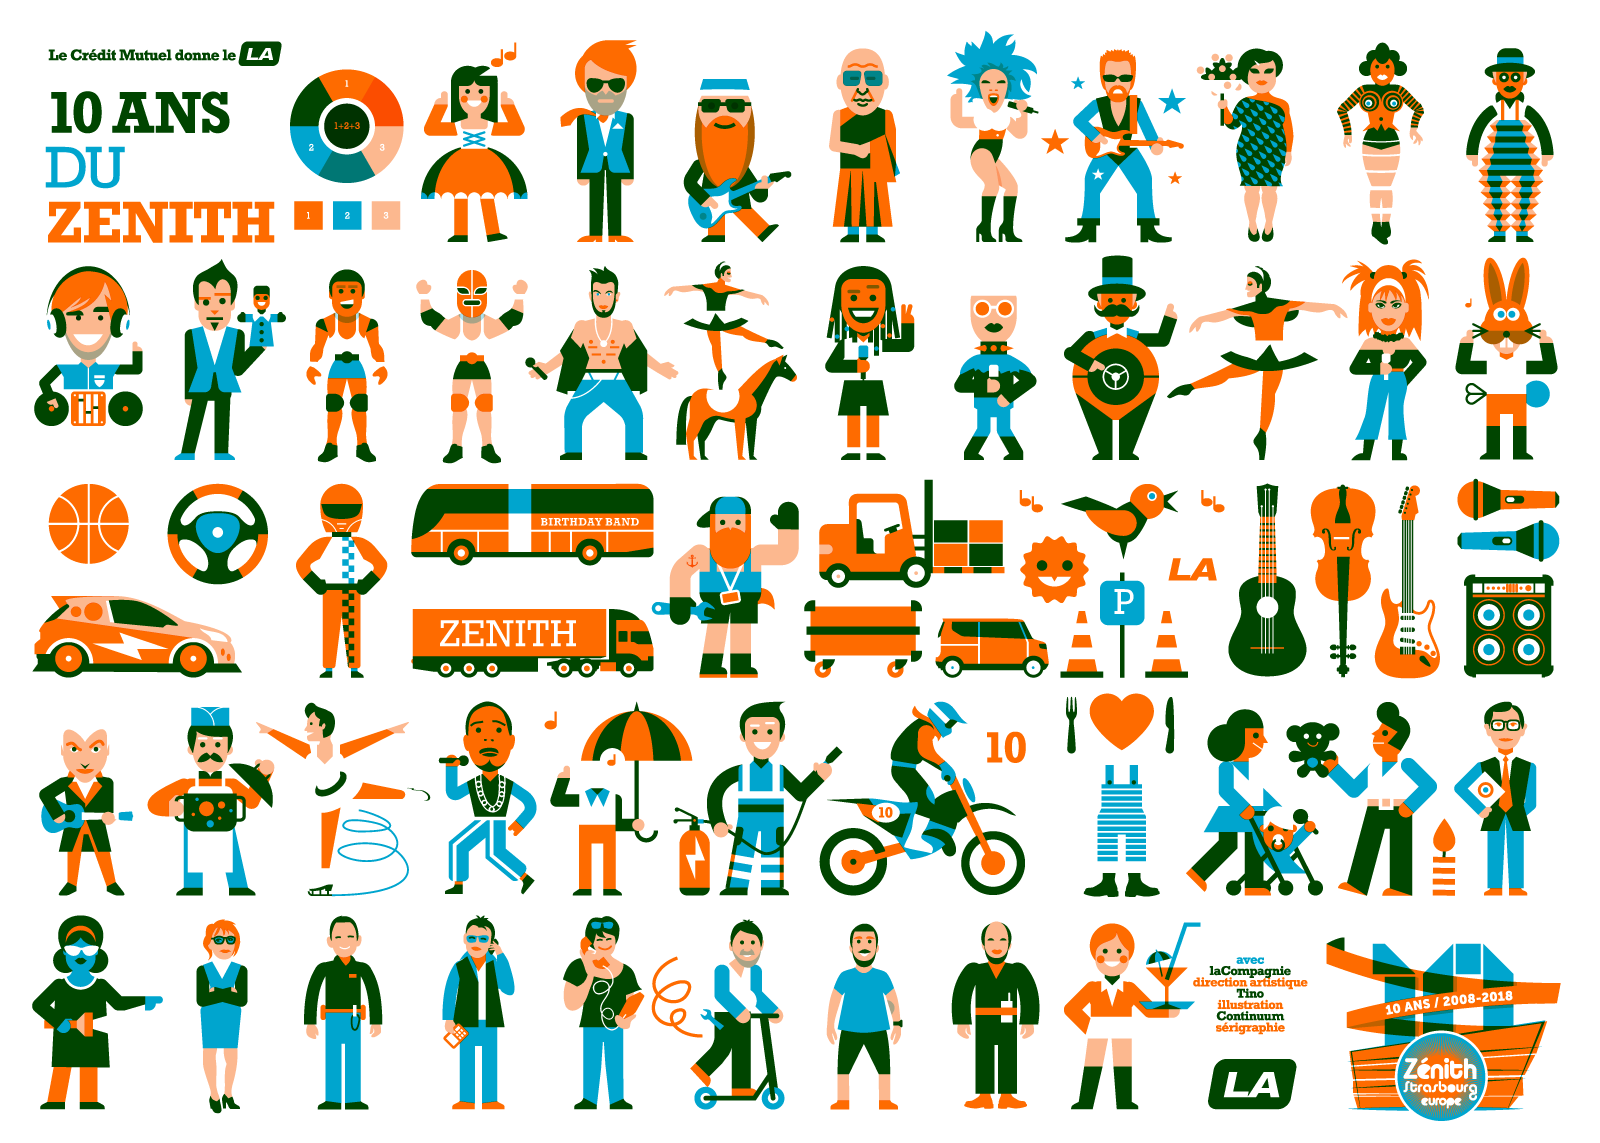 tino-tinoland-zenith-anniversaire-poster-personnages-2